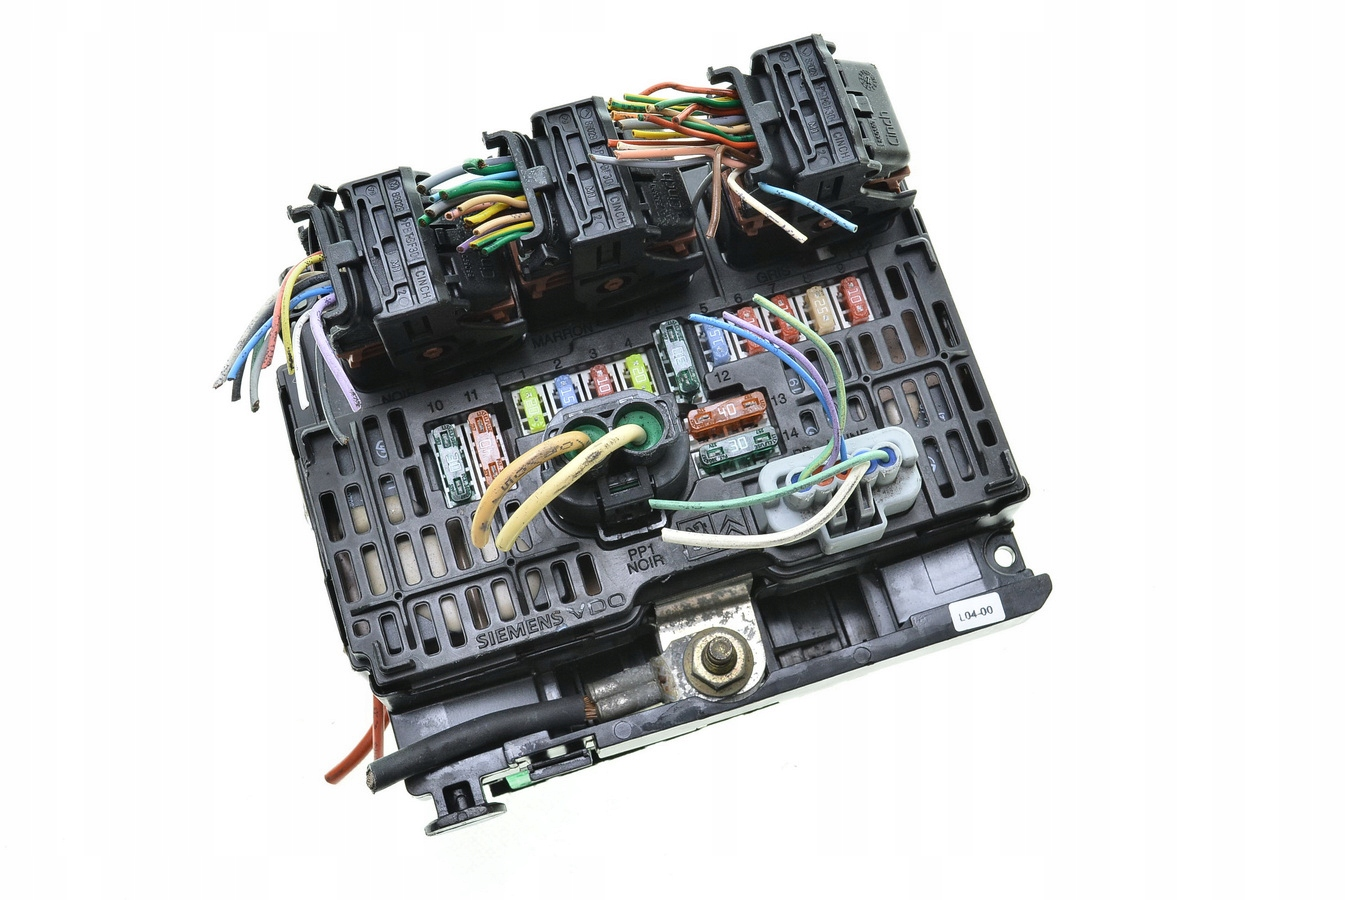 модуль bsm citroen c4 c5 6500ck bsm-l04 s118983004q